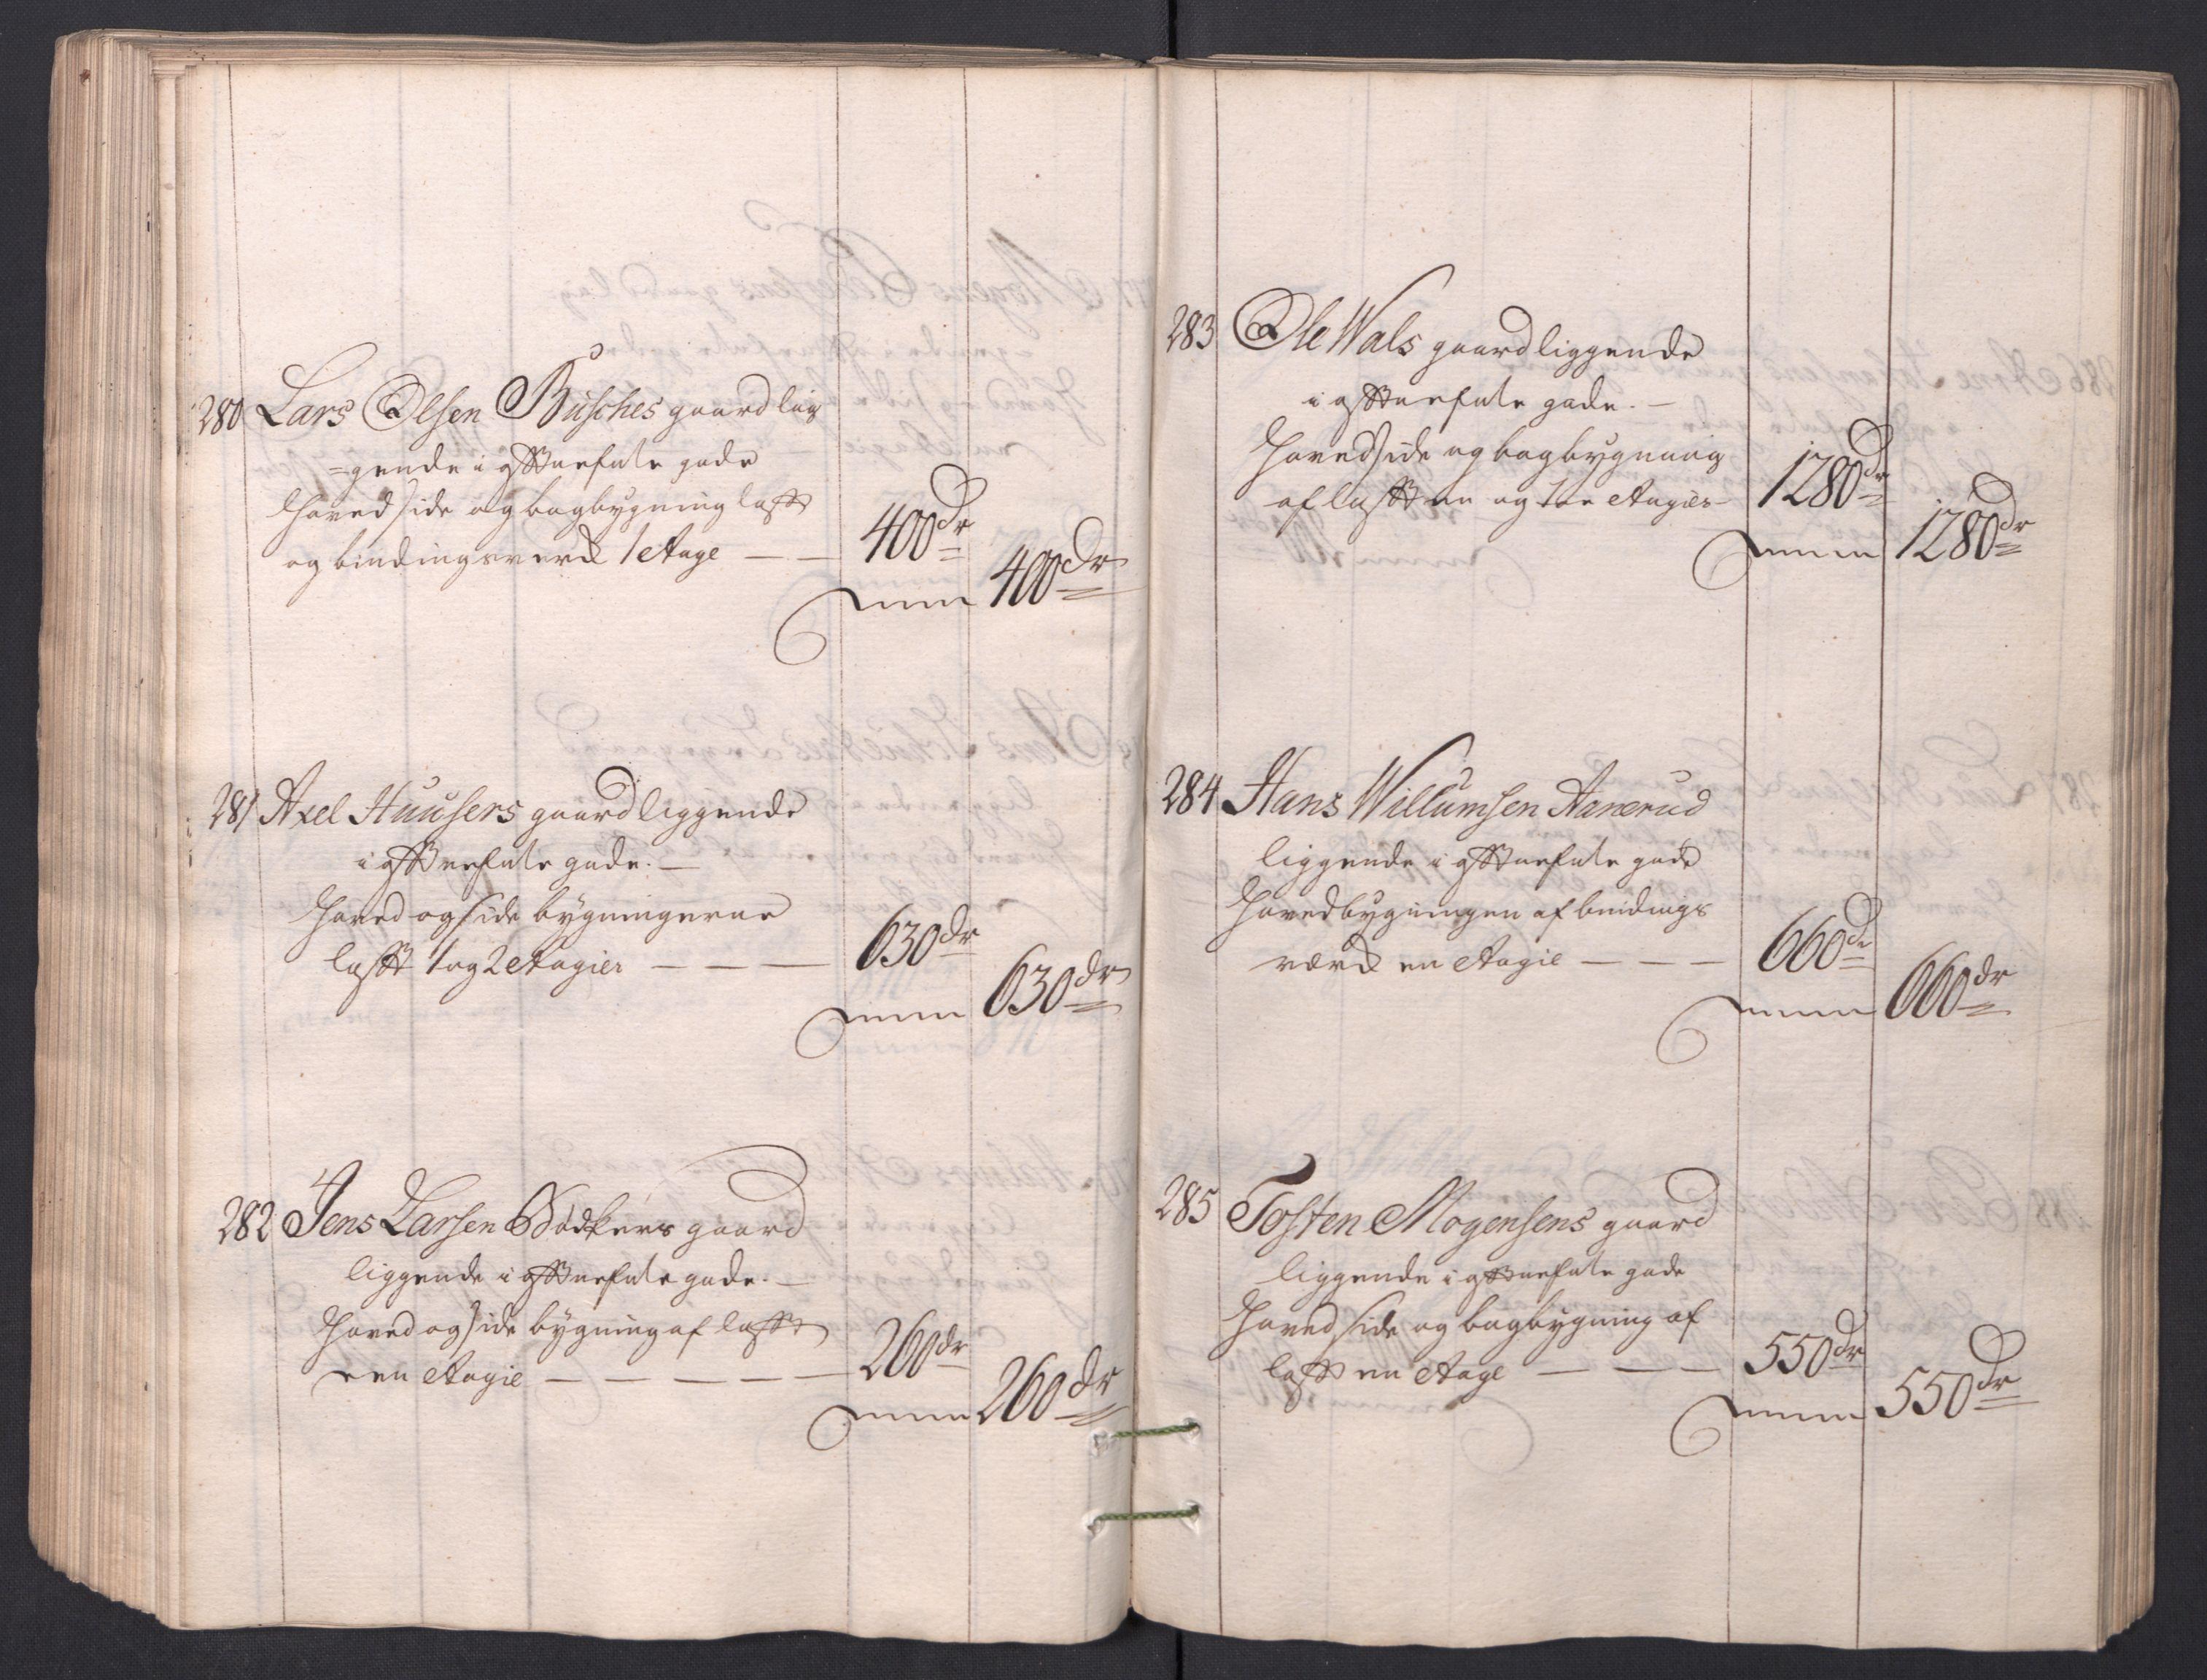 SAO, Kristiania stiftamt, I/Ia/L0001: Branntakster, 1766-1767